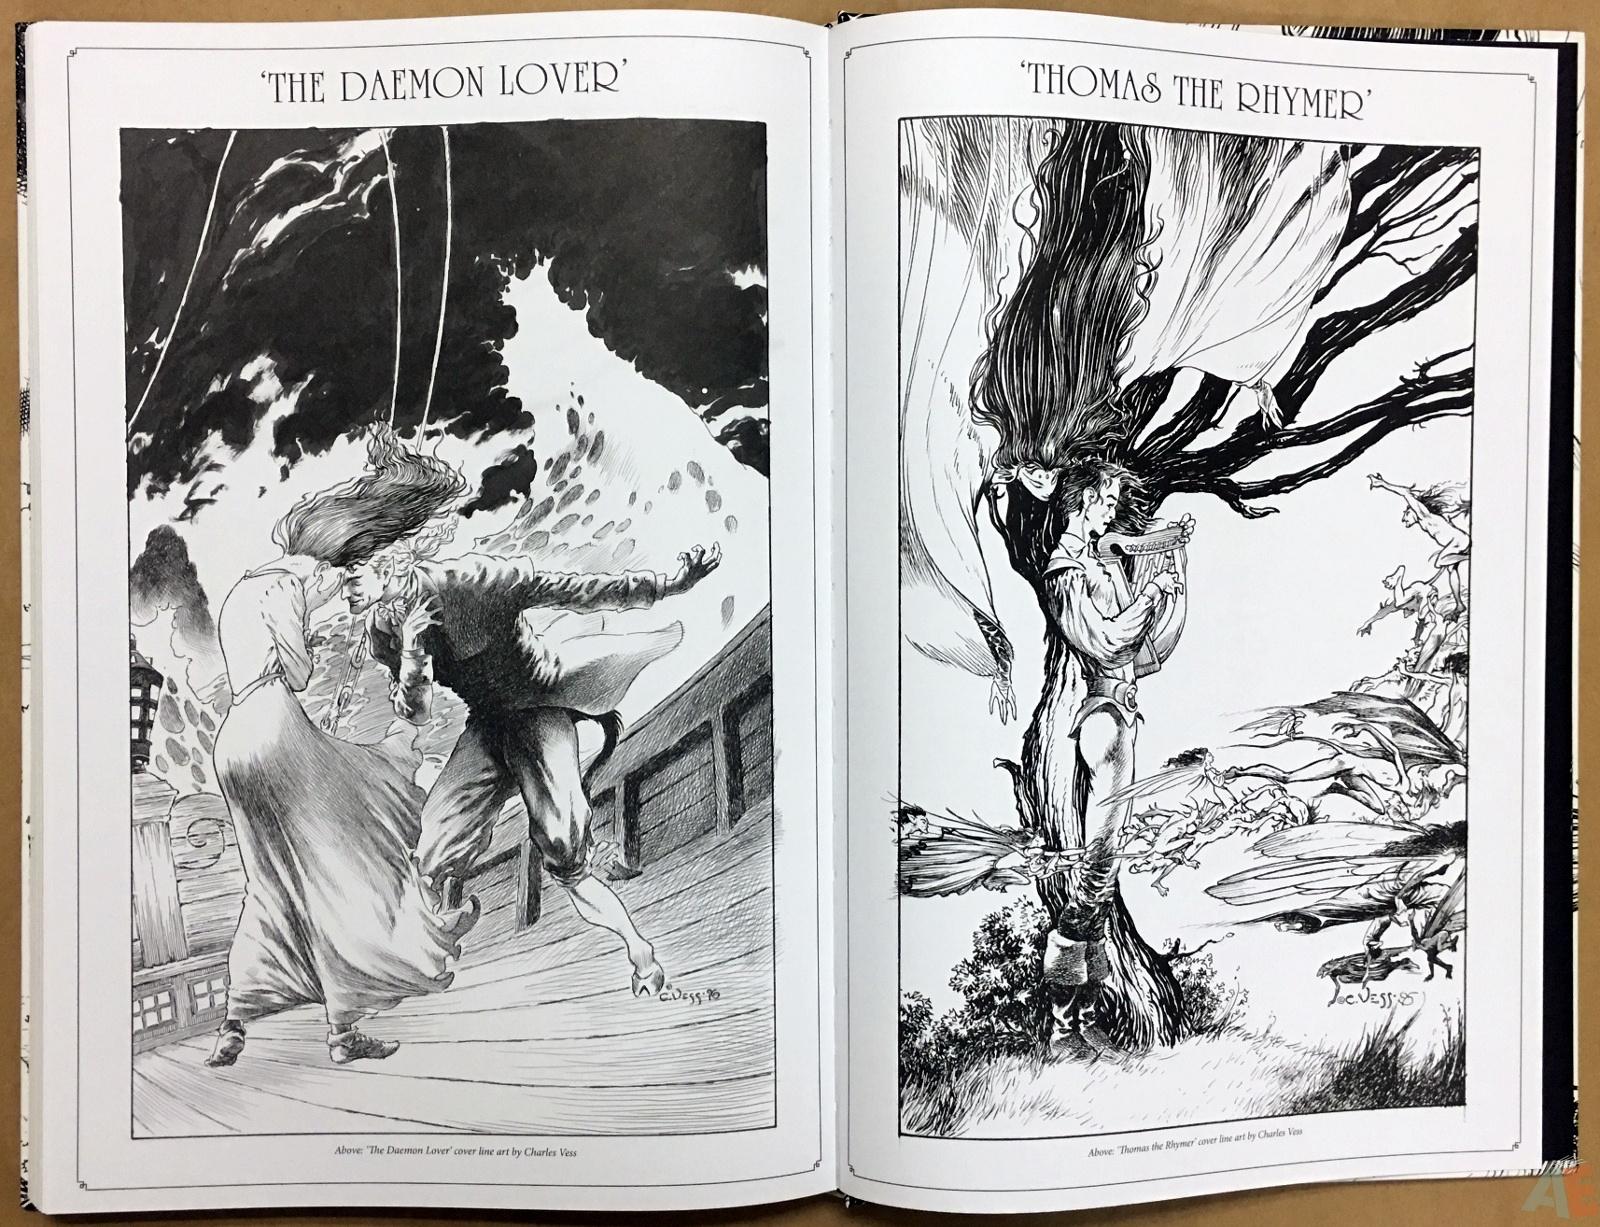 The Book Of Ballads, The Original Art Edition 48